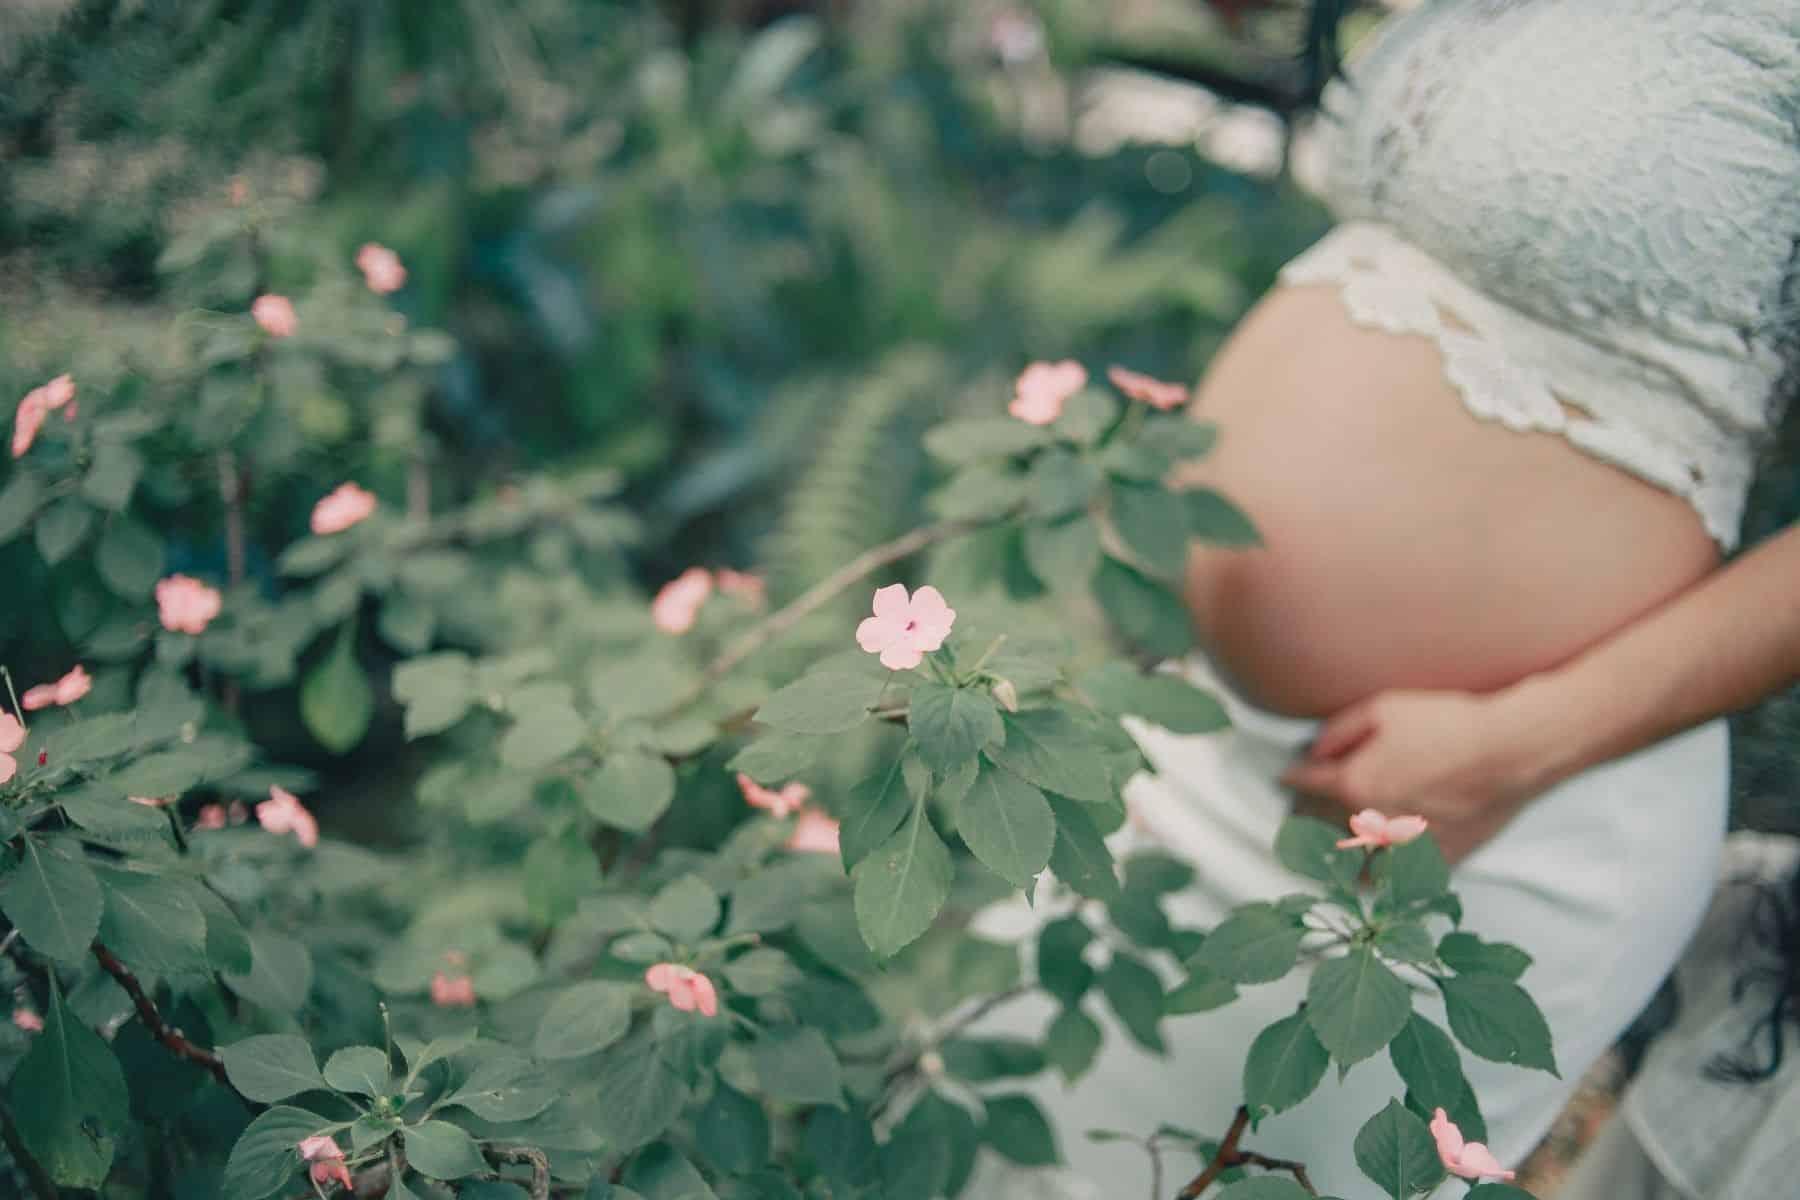 maternity photos - in the flower garden